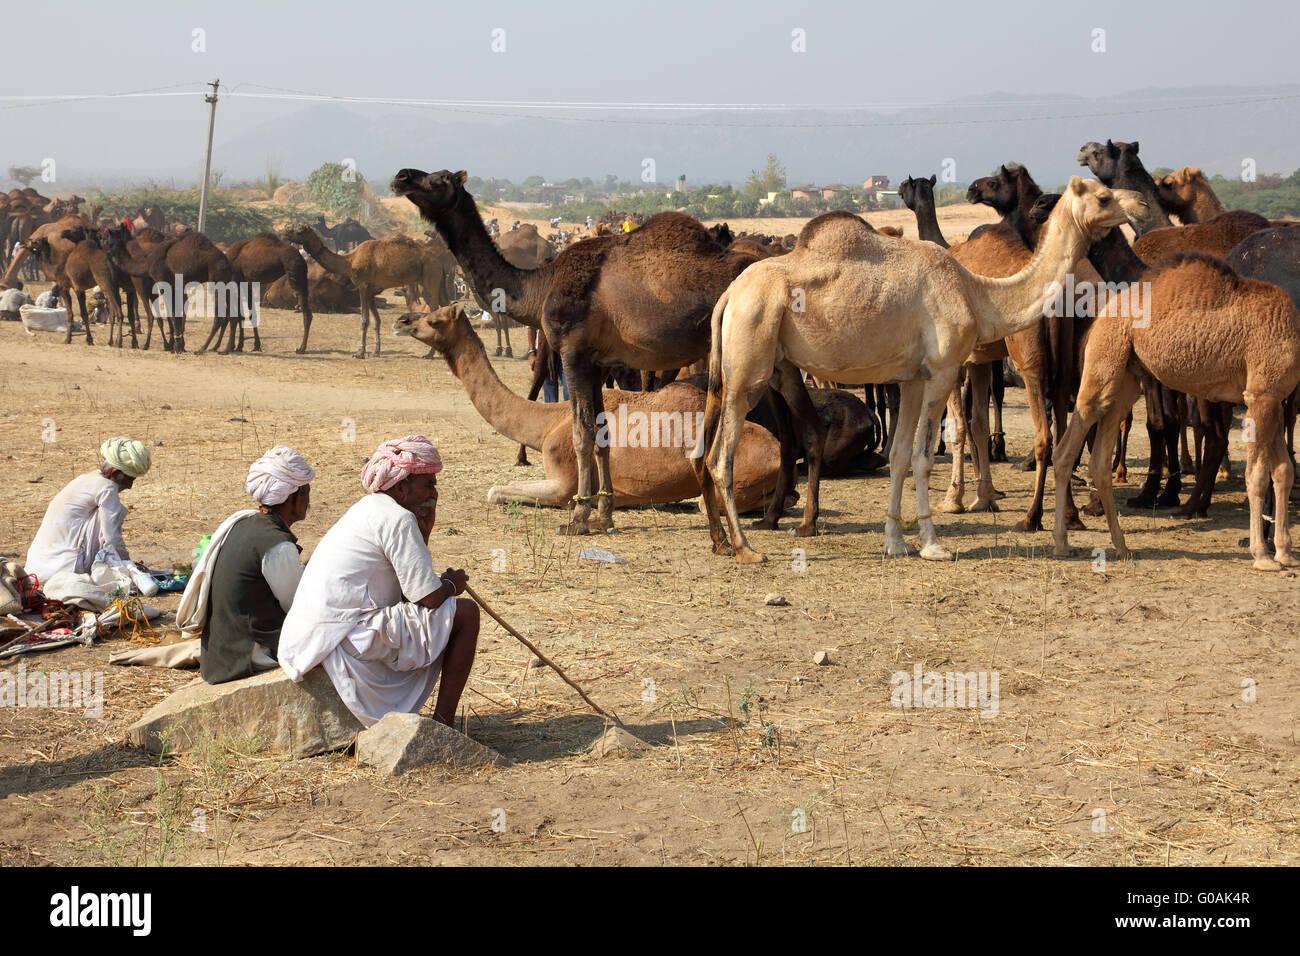 Pushkar Camel Fair - vendedores de camellos durante el festival Imagen De Stock